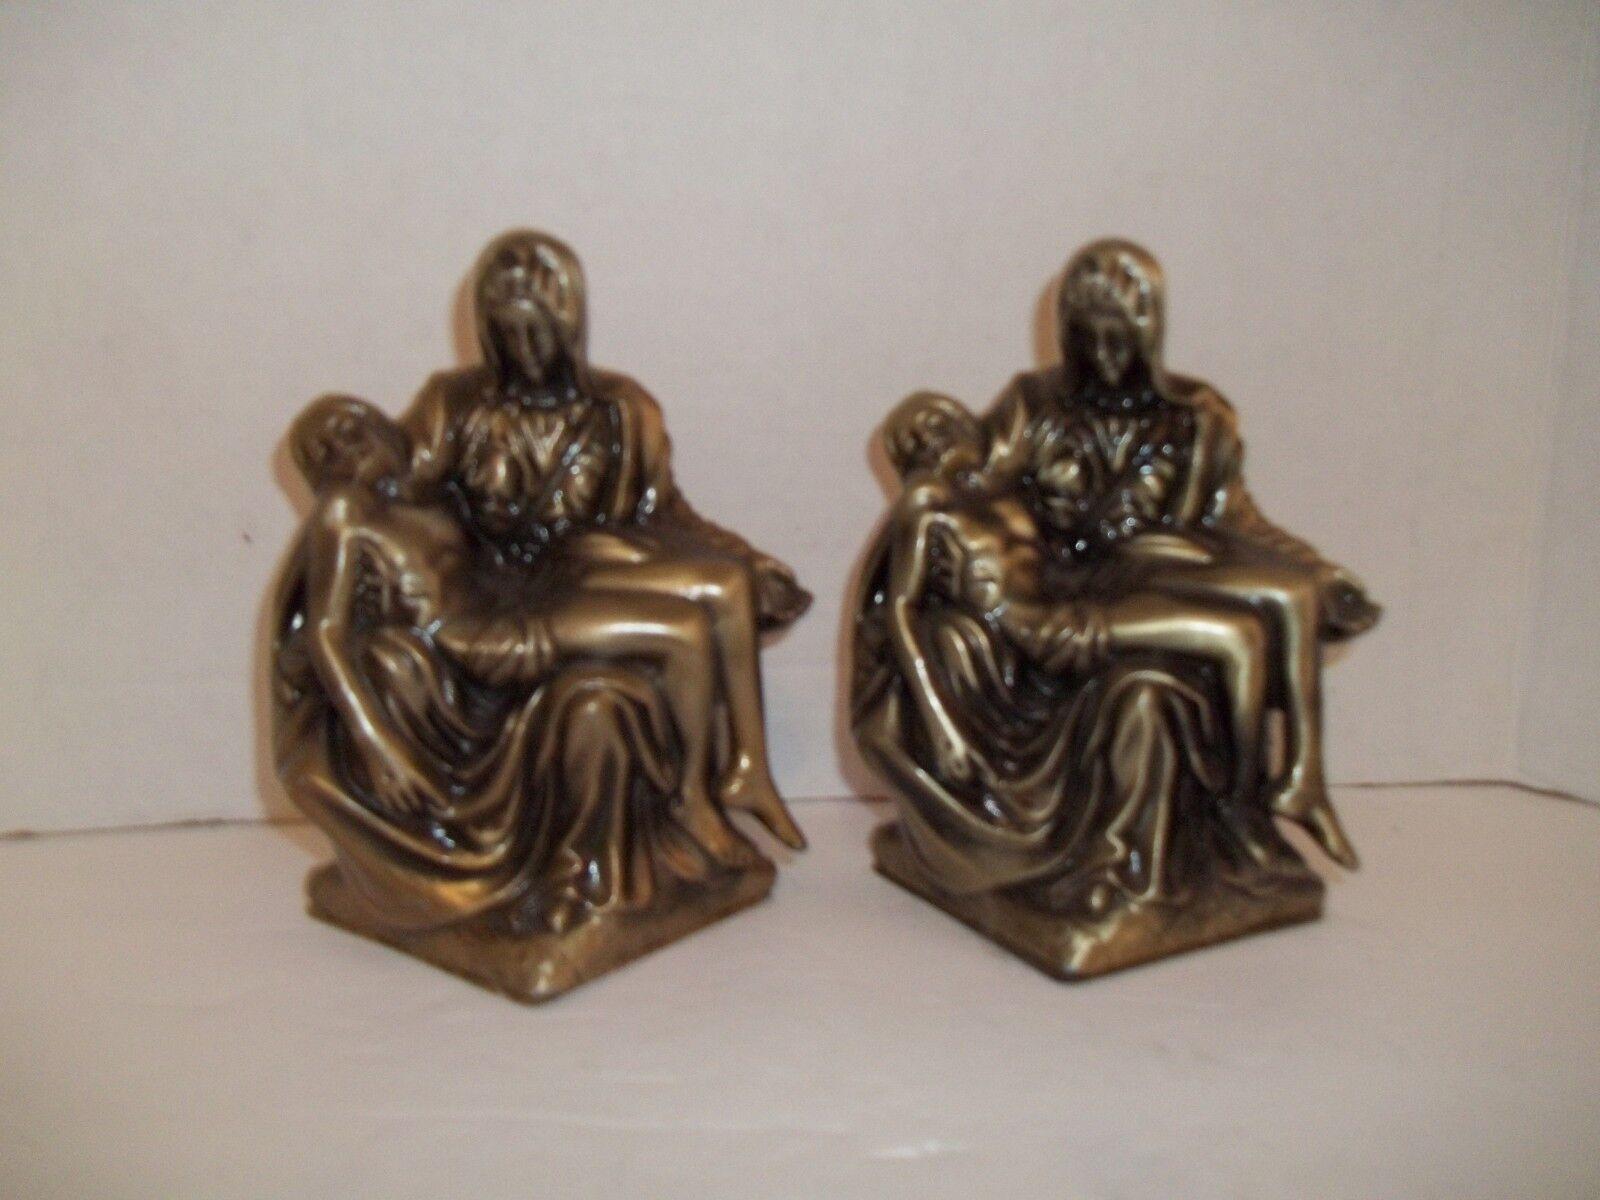 Vintage La Pieta Michelangelo Bücherstützen Gold Messing Ton Guss Metall Ostern